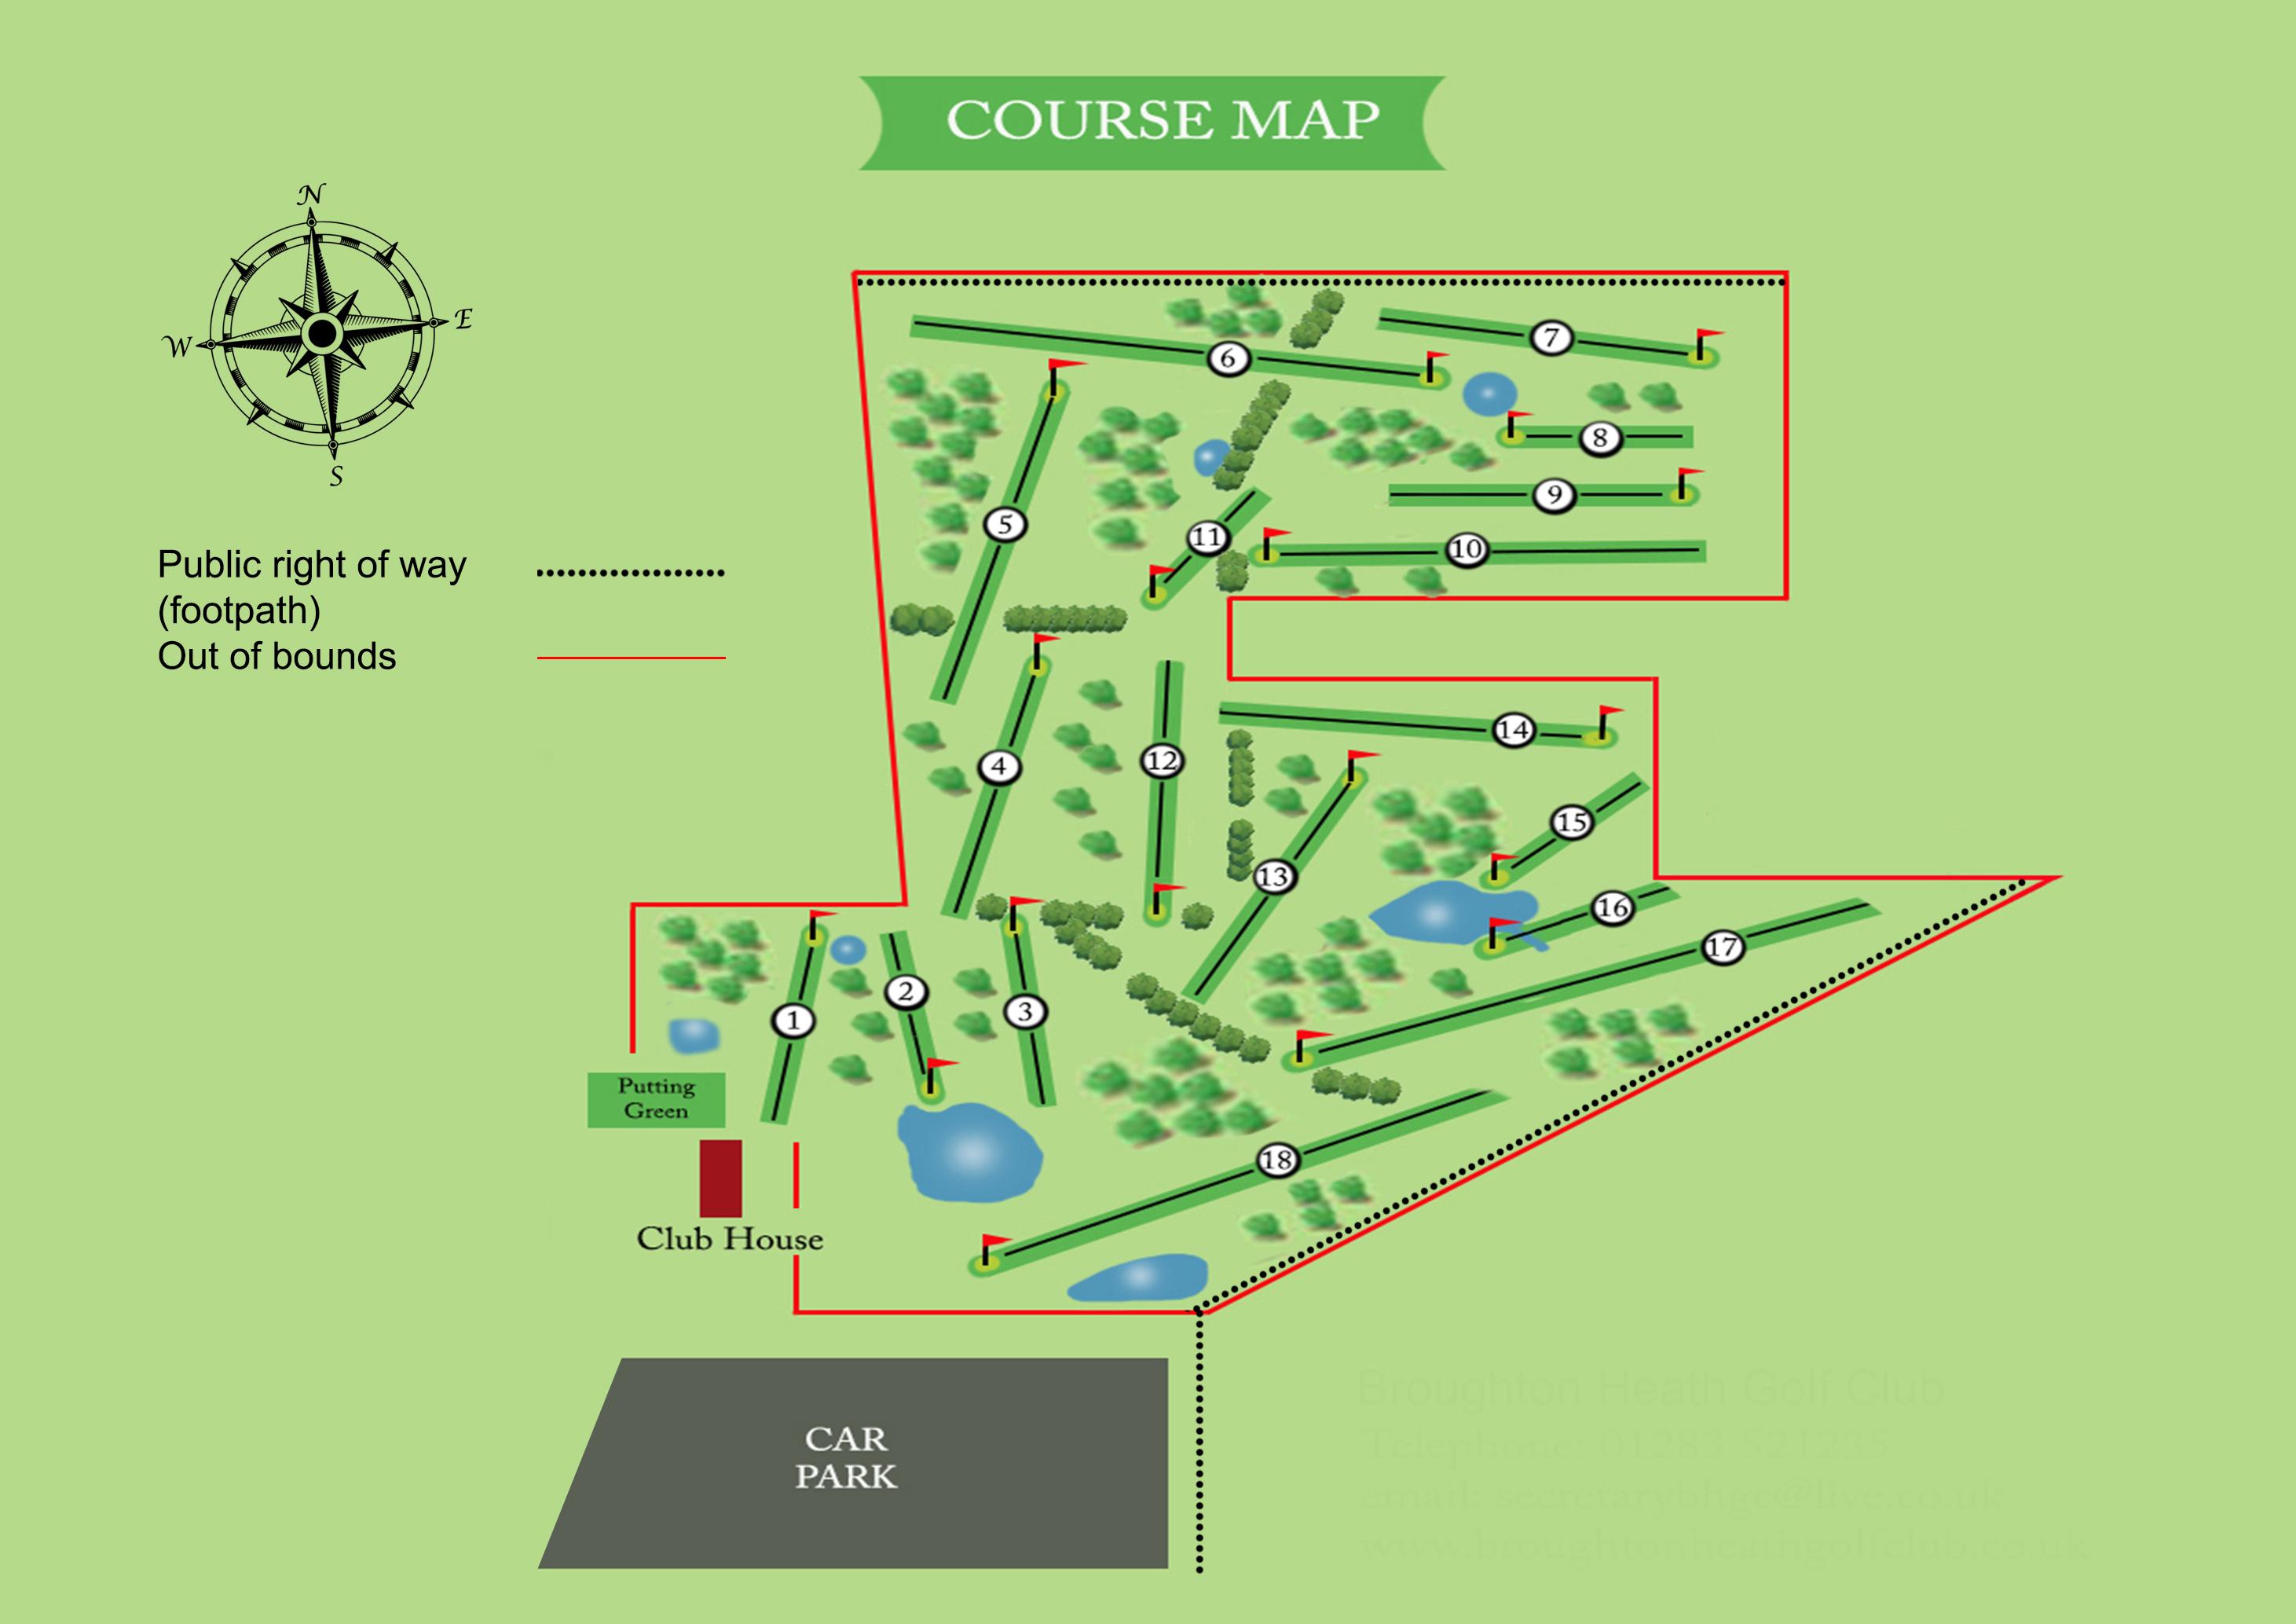 bhgc course map